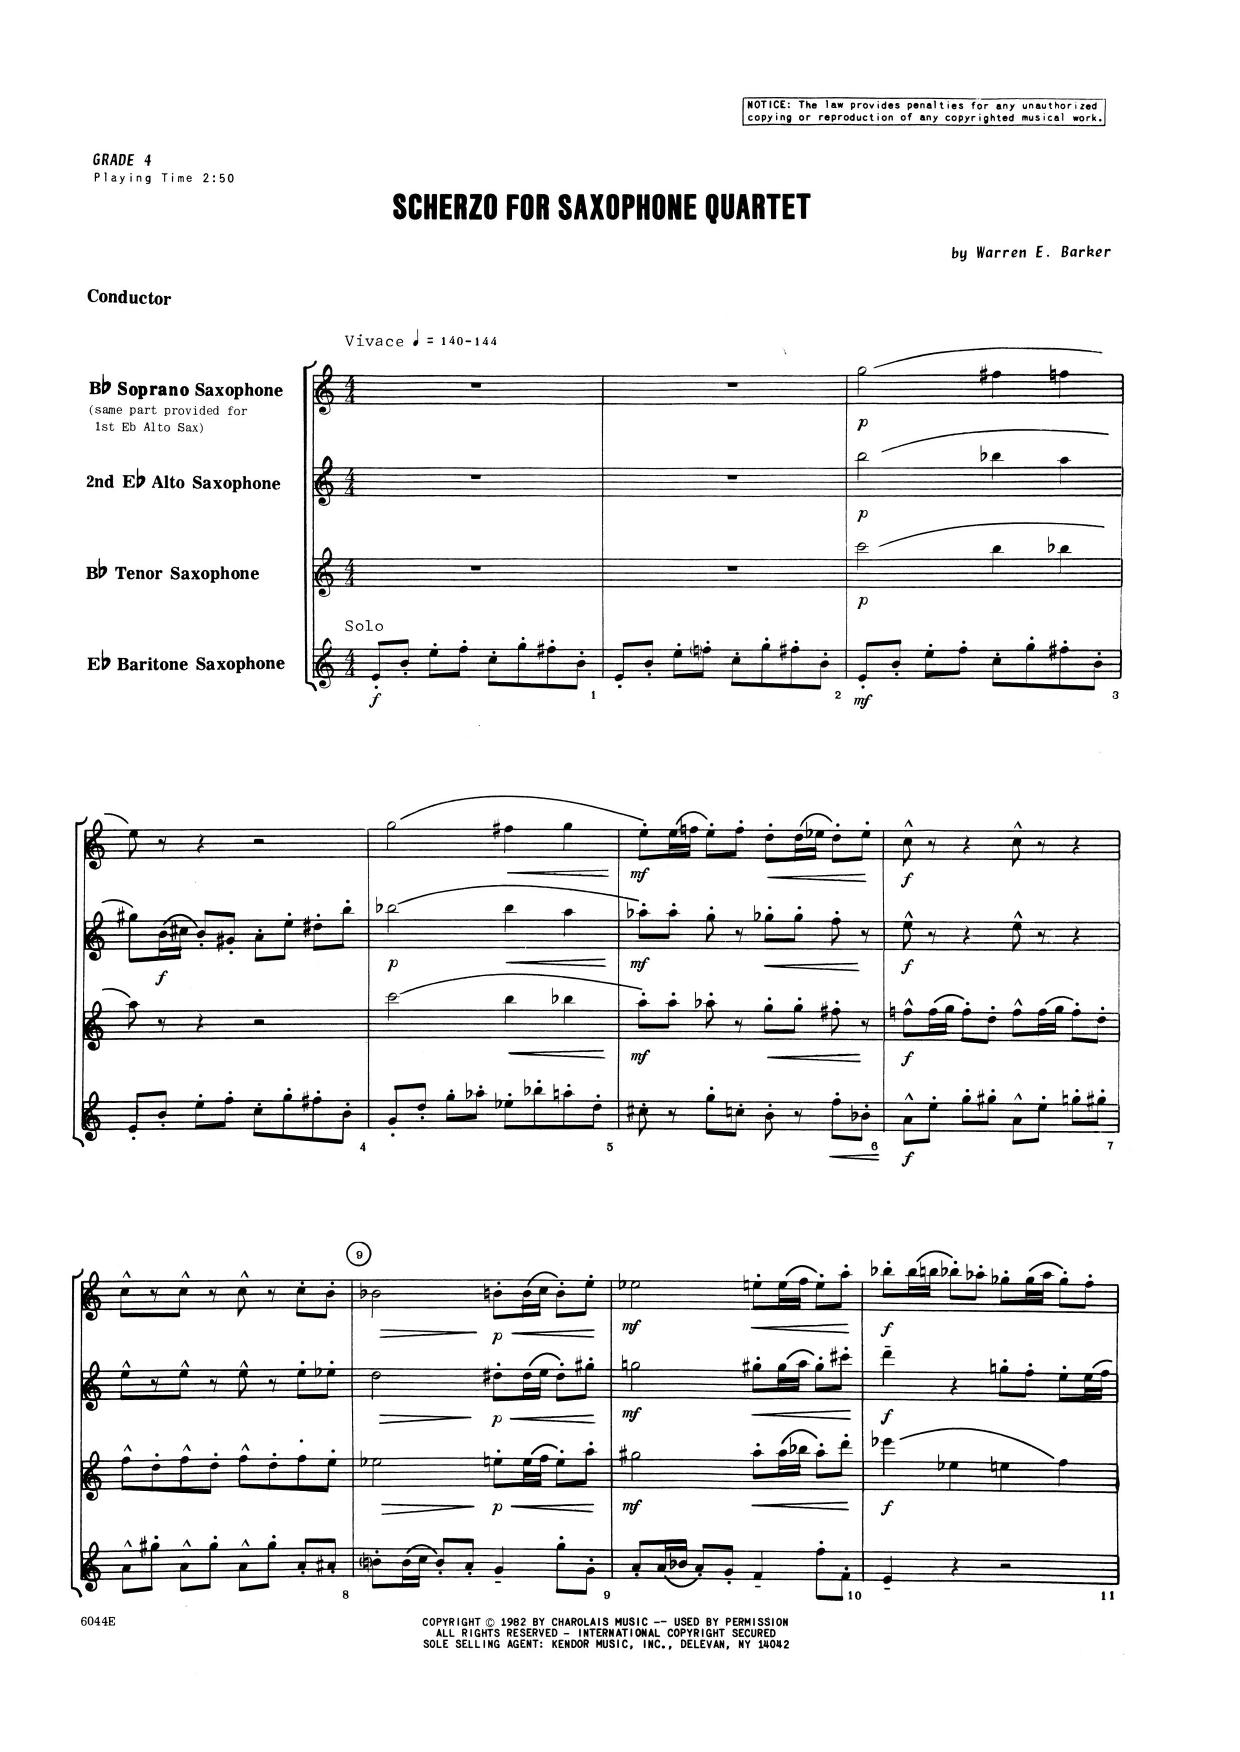 Scherzo for Saxophone Quartet (COMPLETE) sheet music for saxophone quartet by Warren Barker. Score Image Preview.